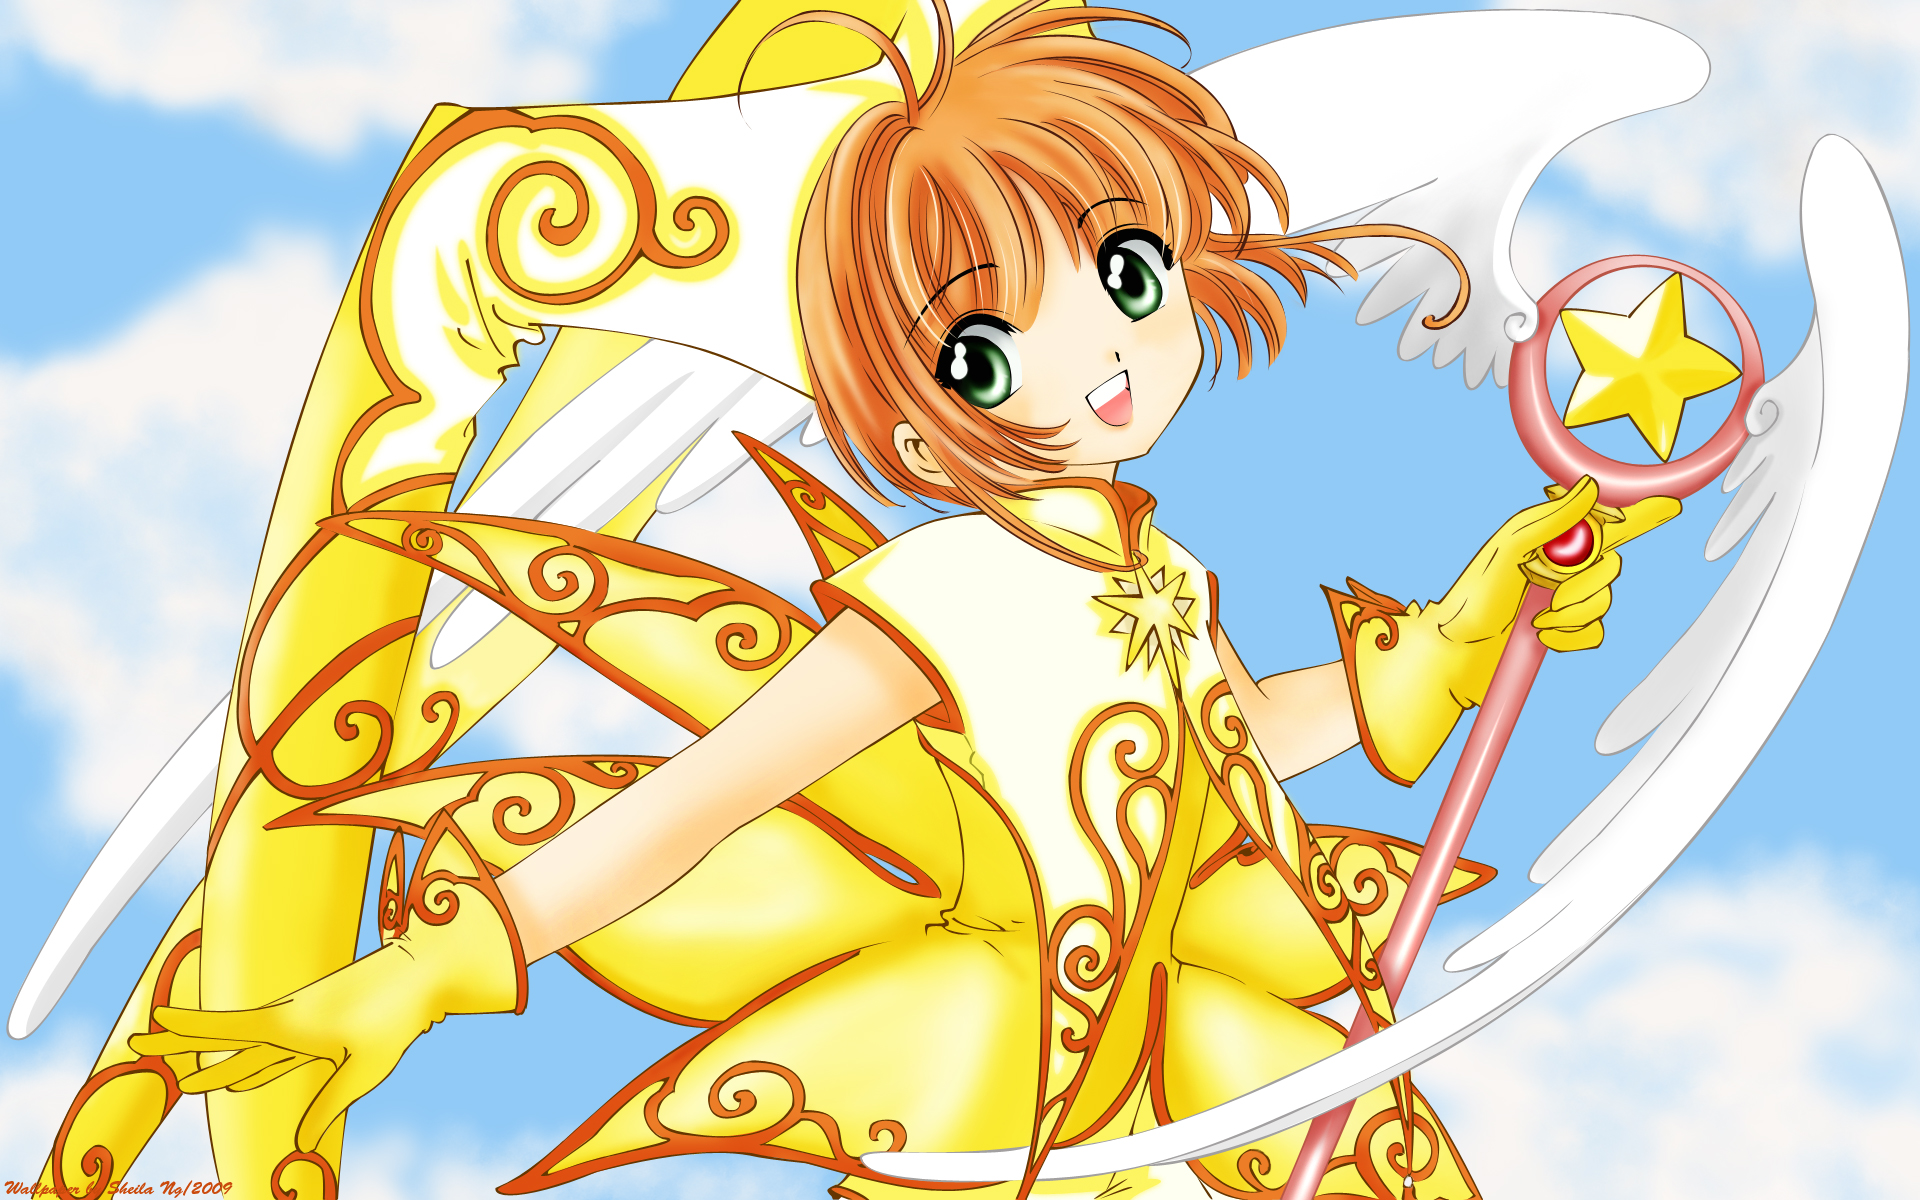 captor sakura card anime for Erotic